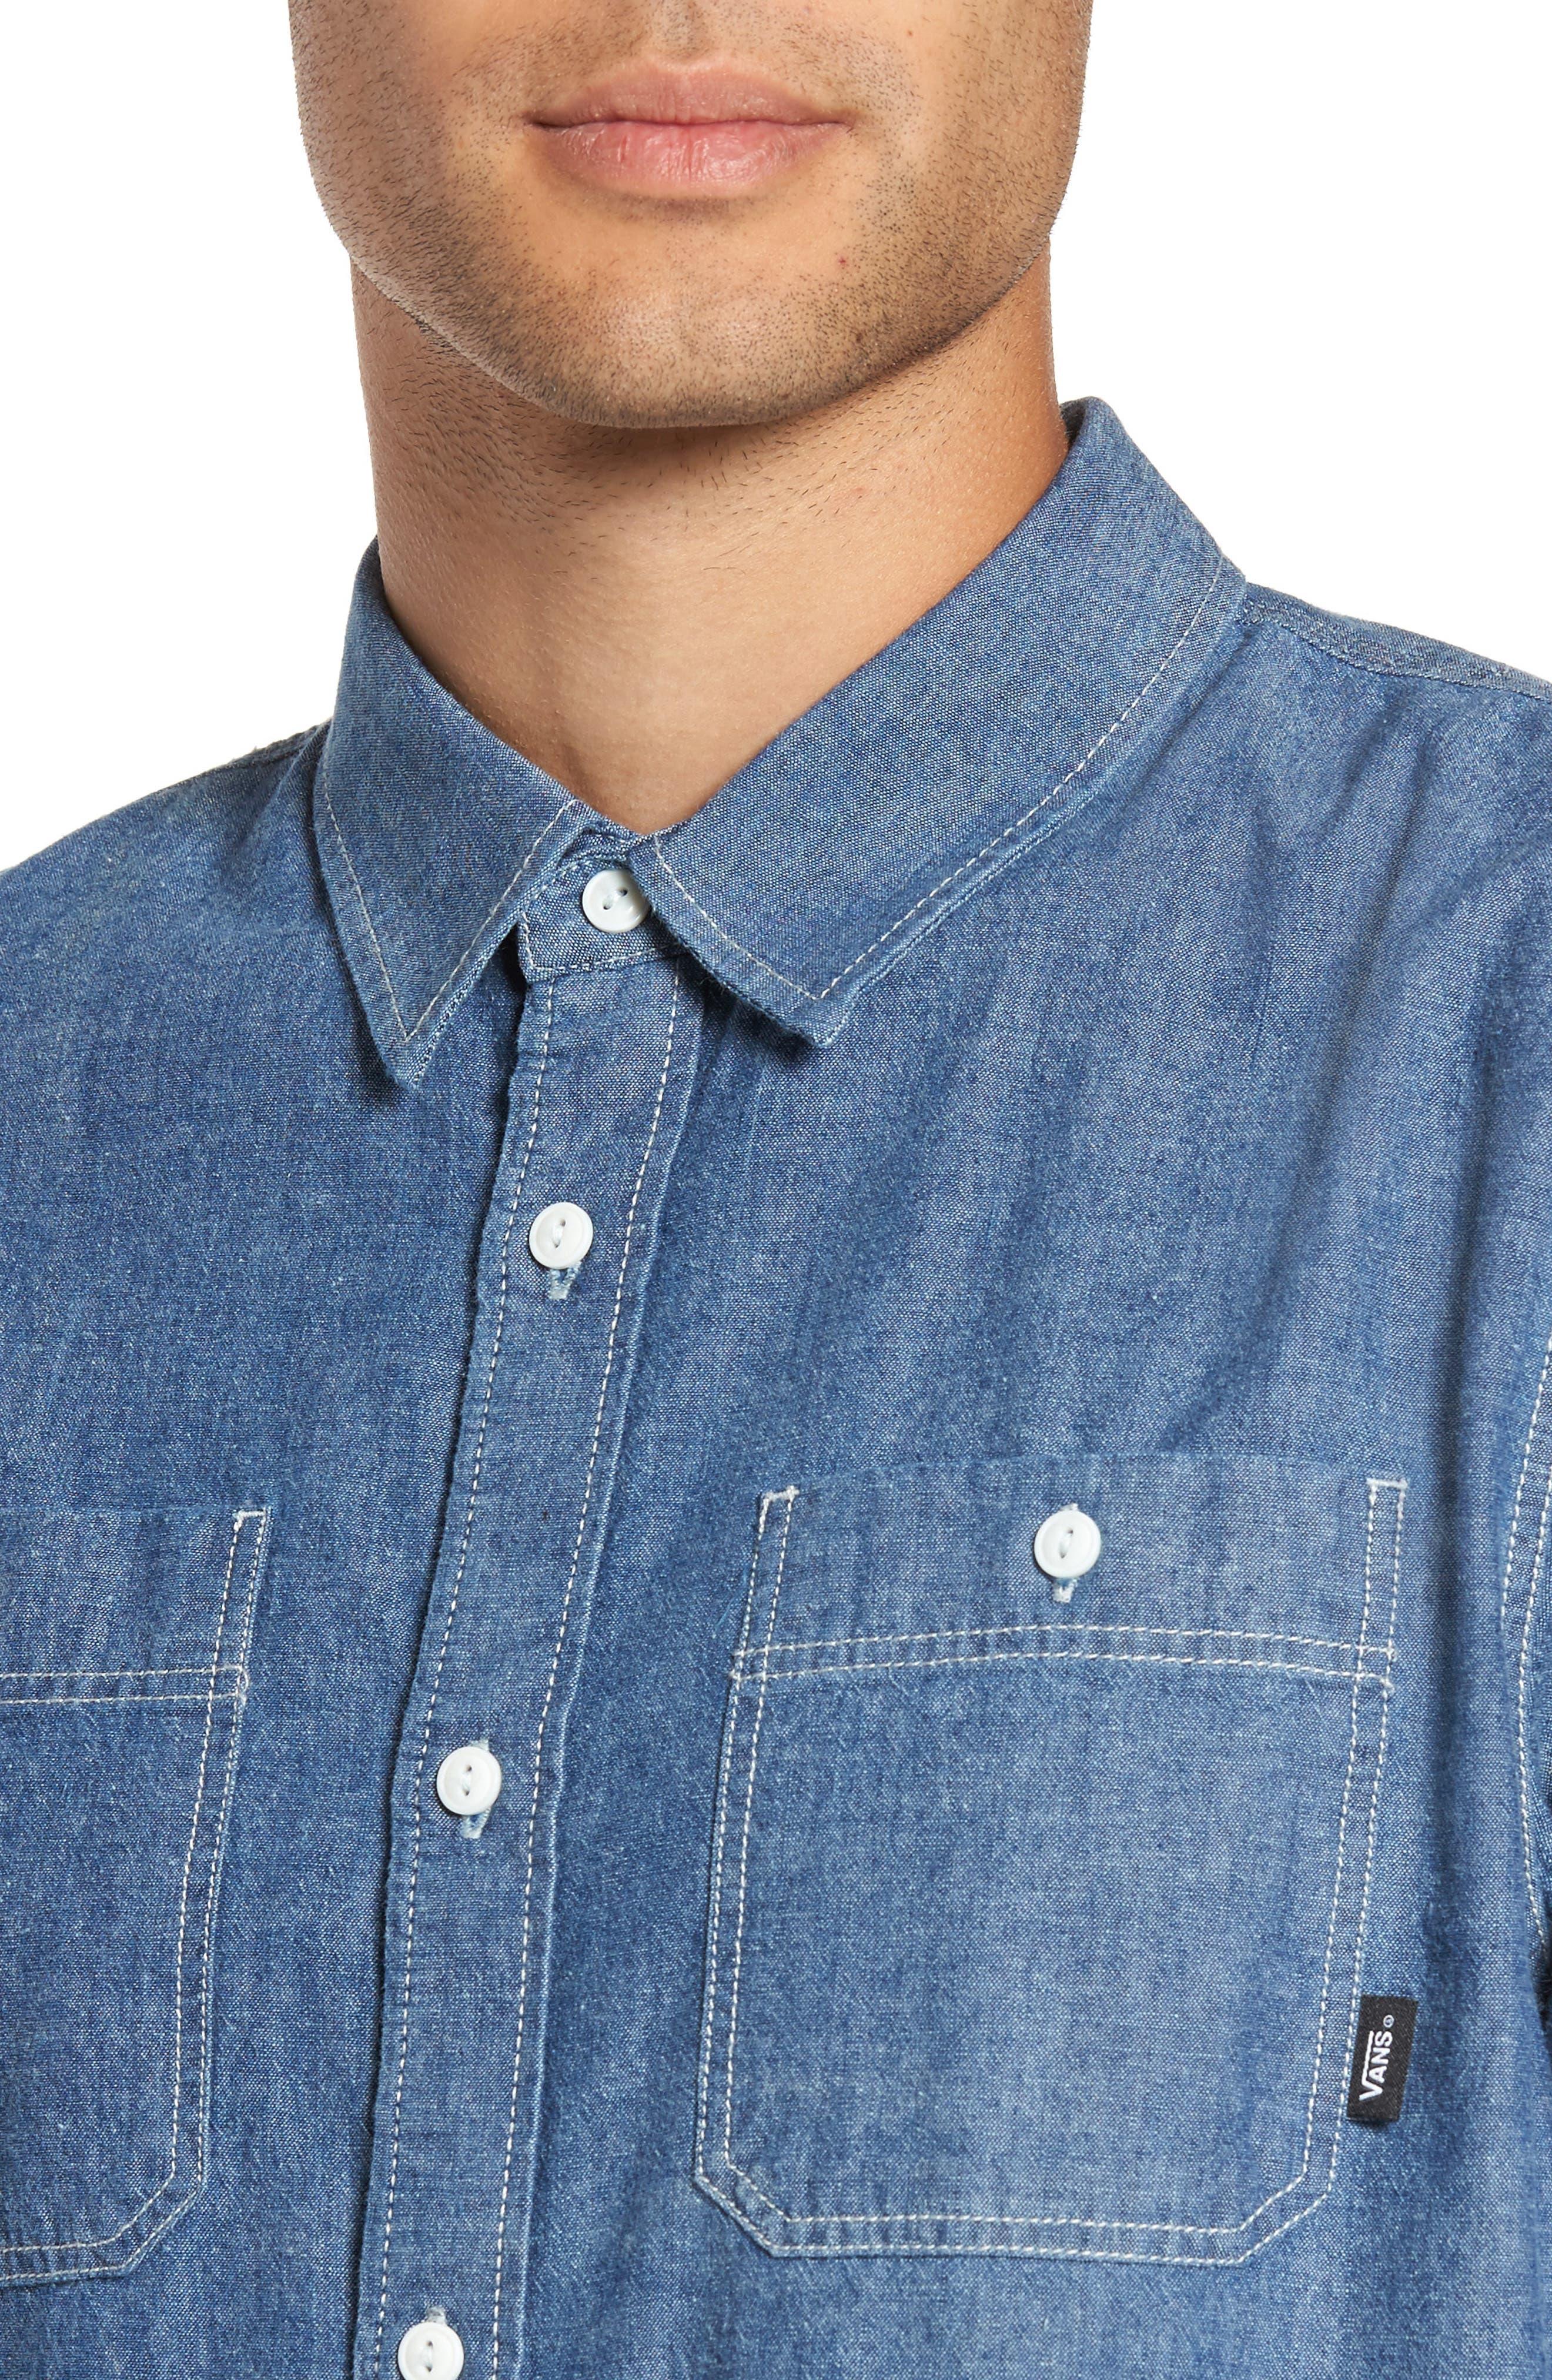 Carlow Chambray Woven Shirt,                             Alternate thumbnail 4, color,